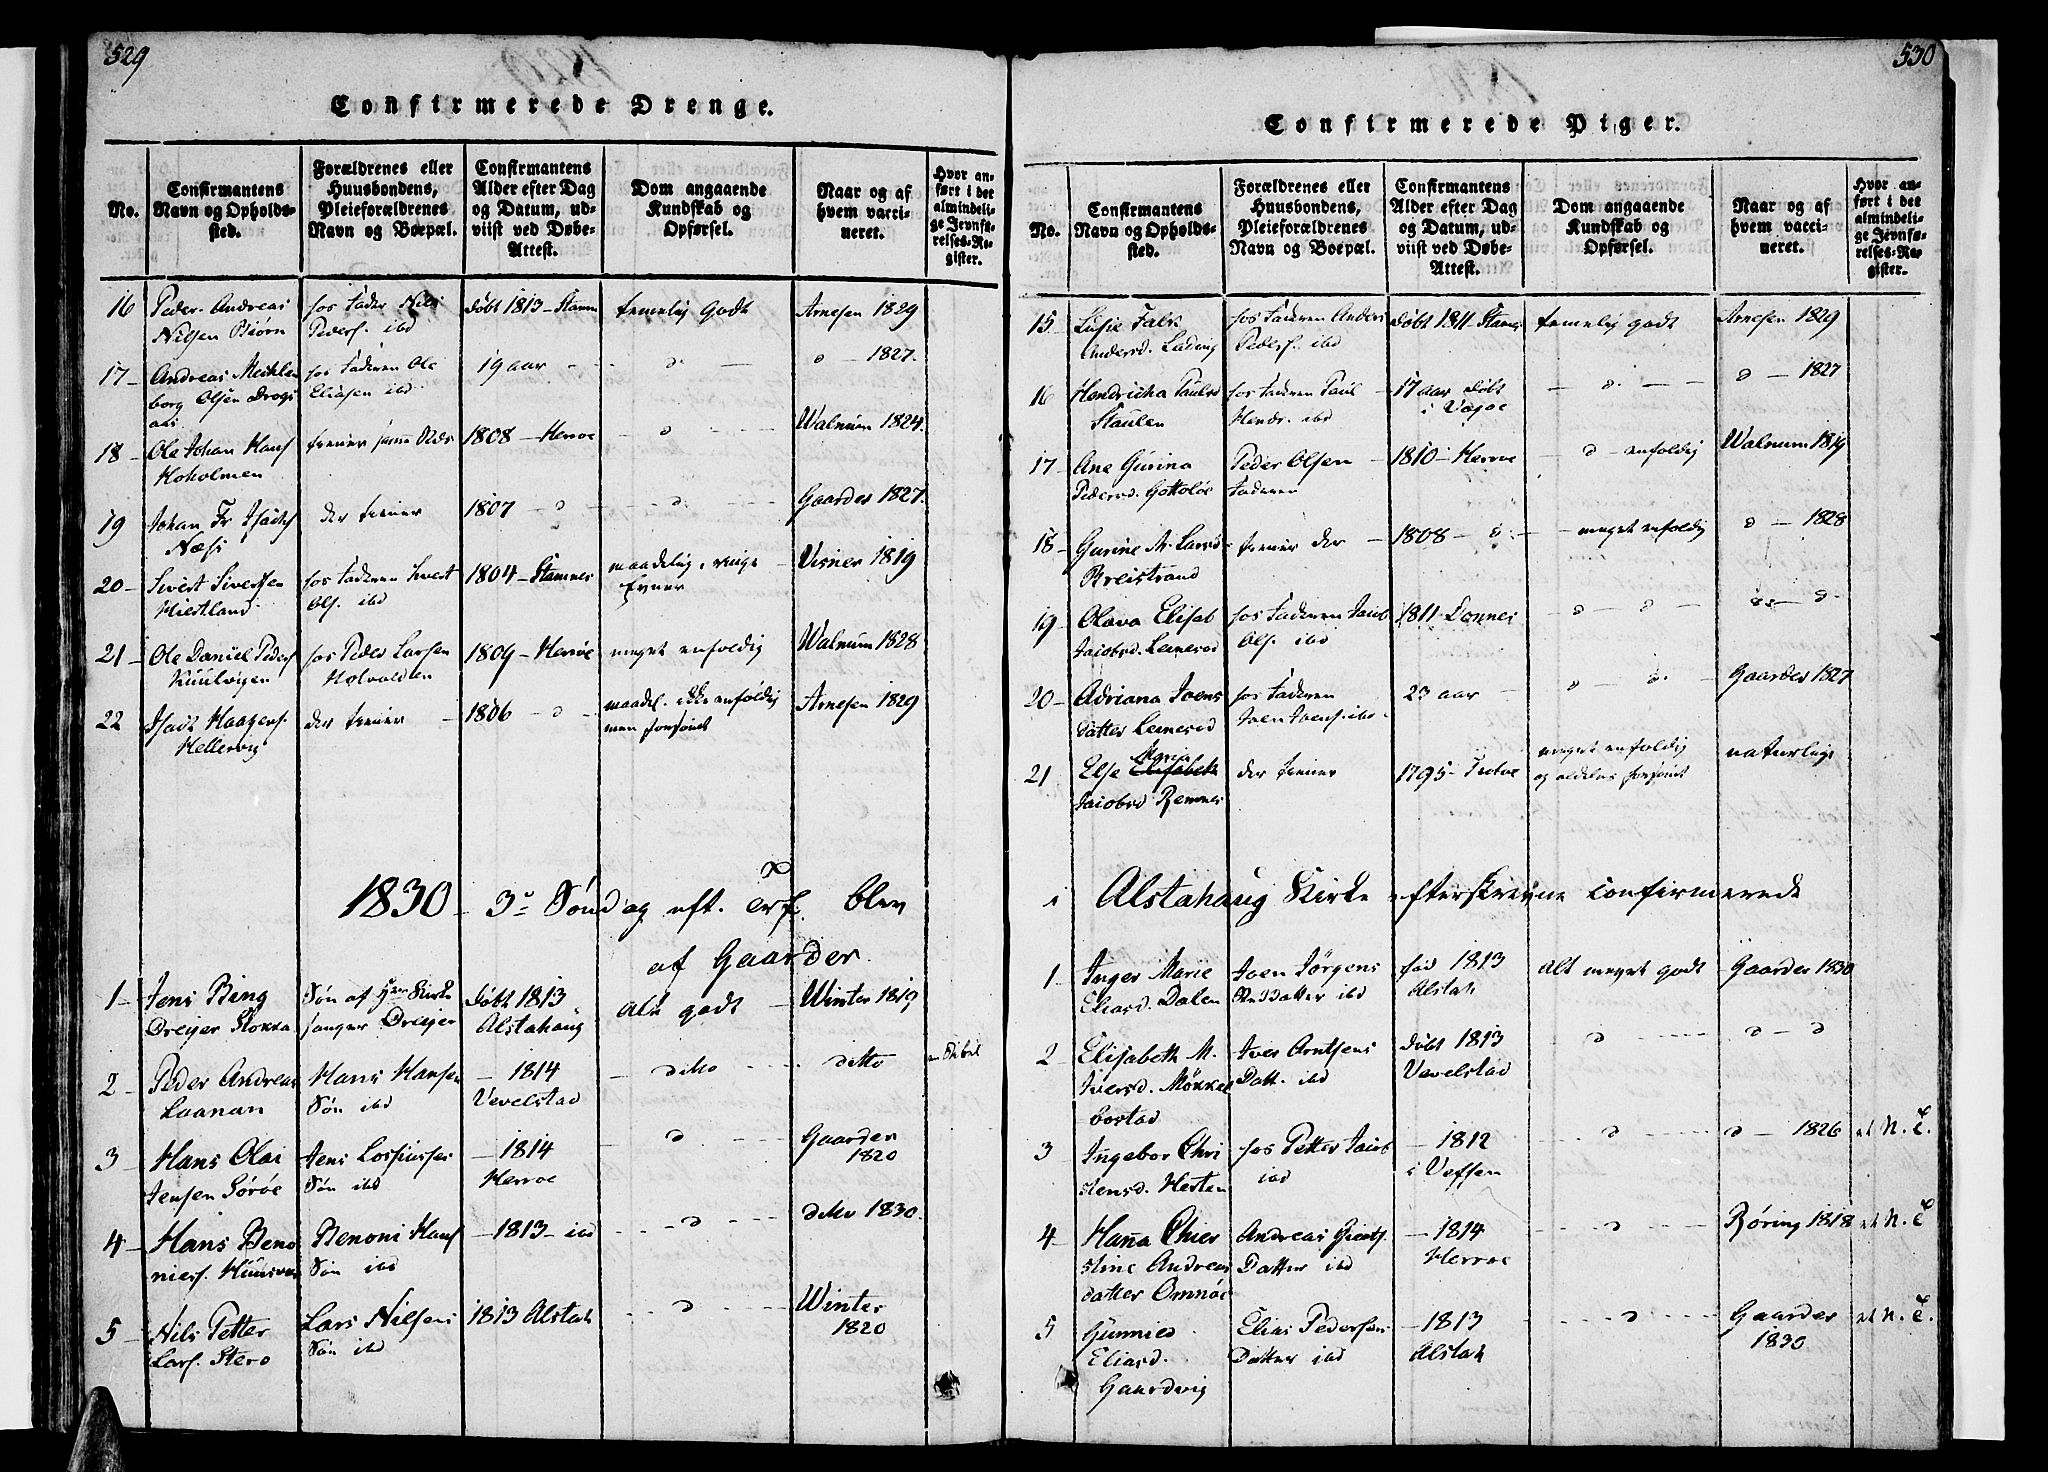 SAT, Ministerialprotokoller, klokkerbøker og fødselsregistre - Nordland, 830/L0445: Ministerialbok nr. 830A09, 1820-1830, s. 529-530